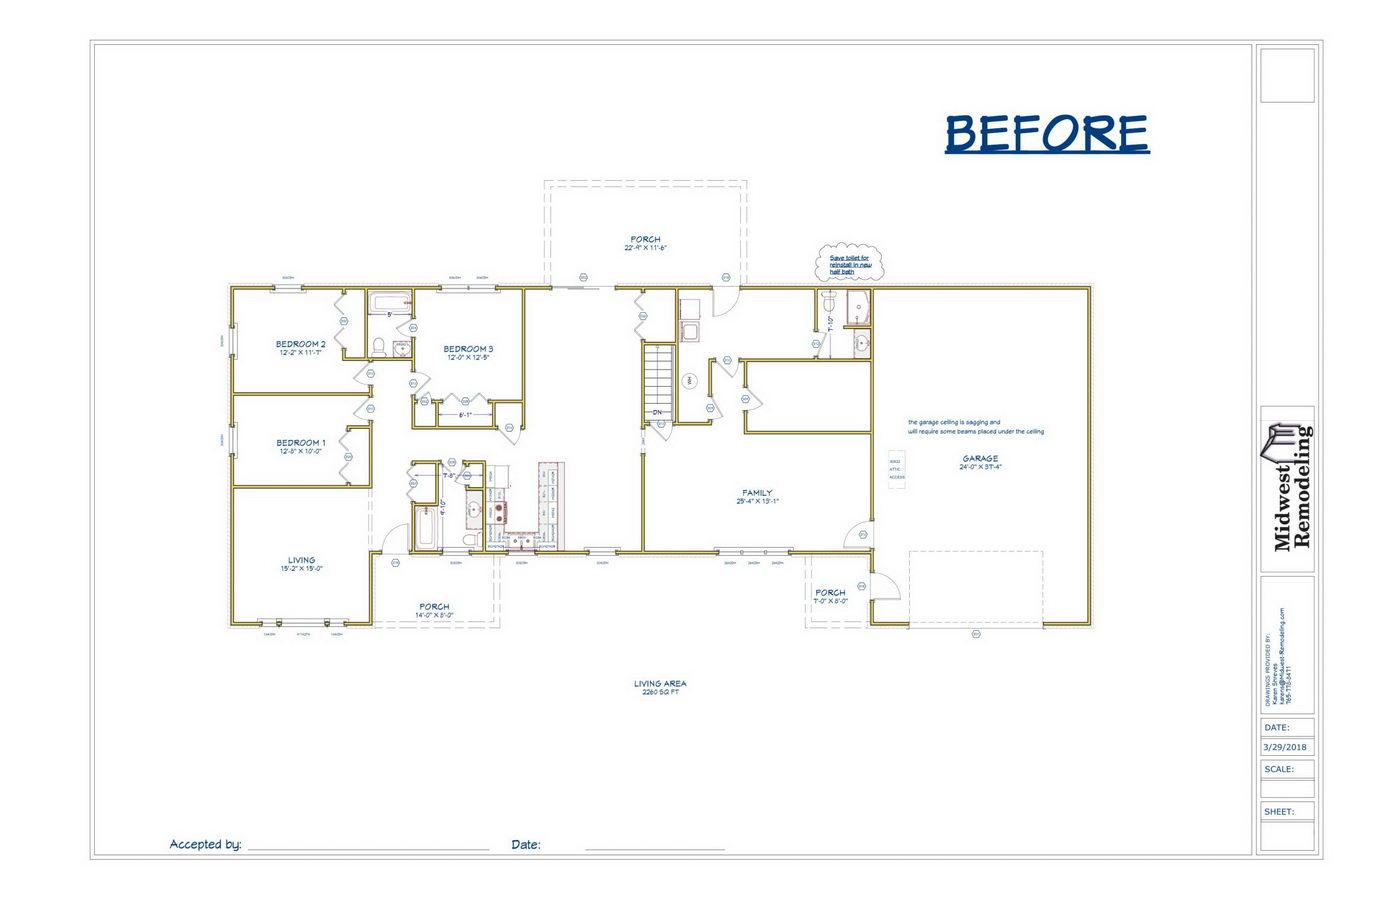 Pendleton room addition-1